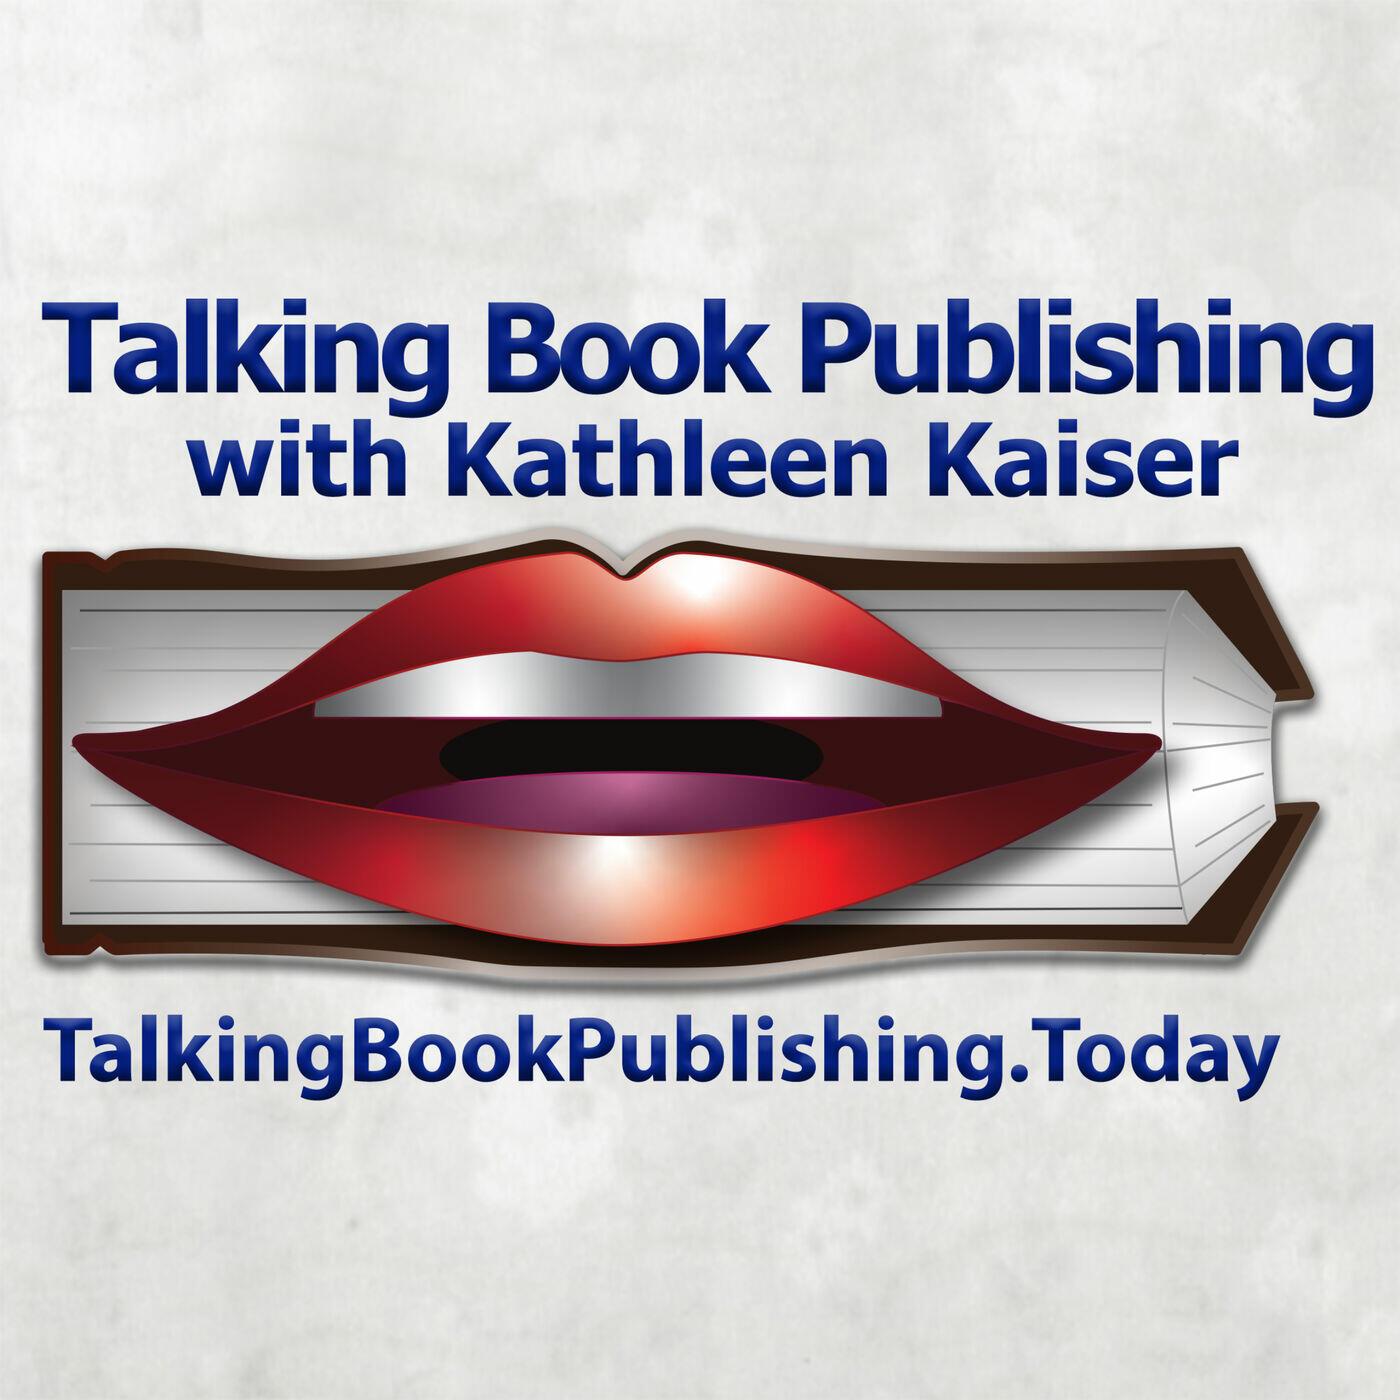 Talking Book Publishing with Kathleen Kaiser